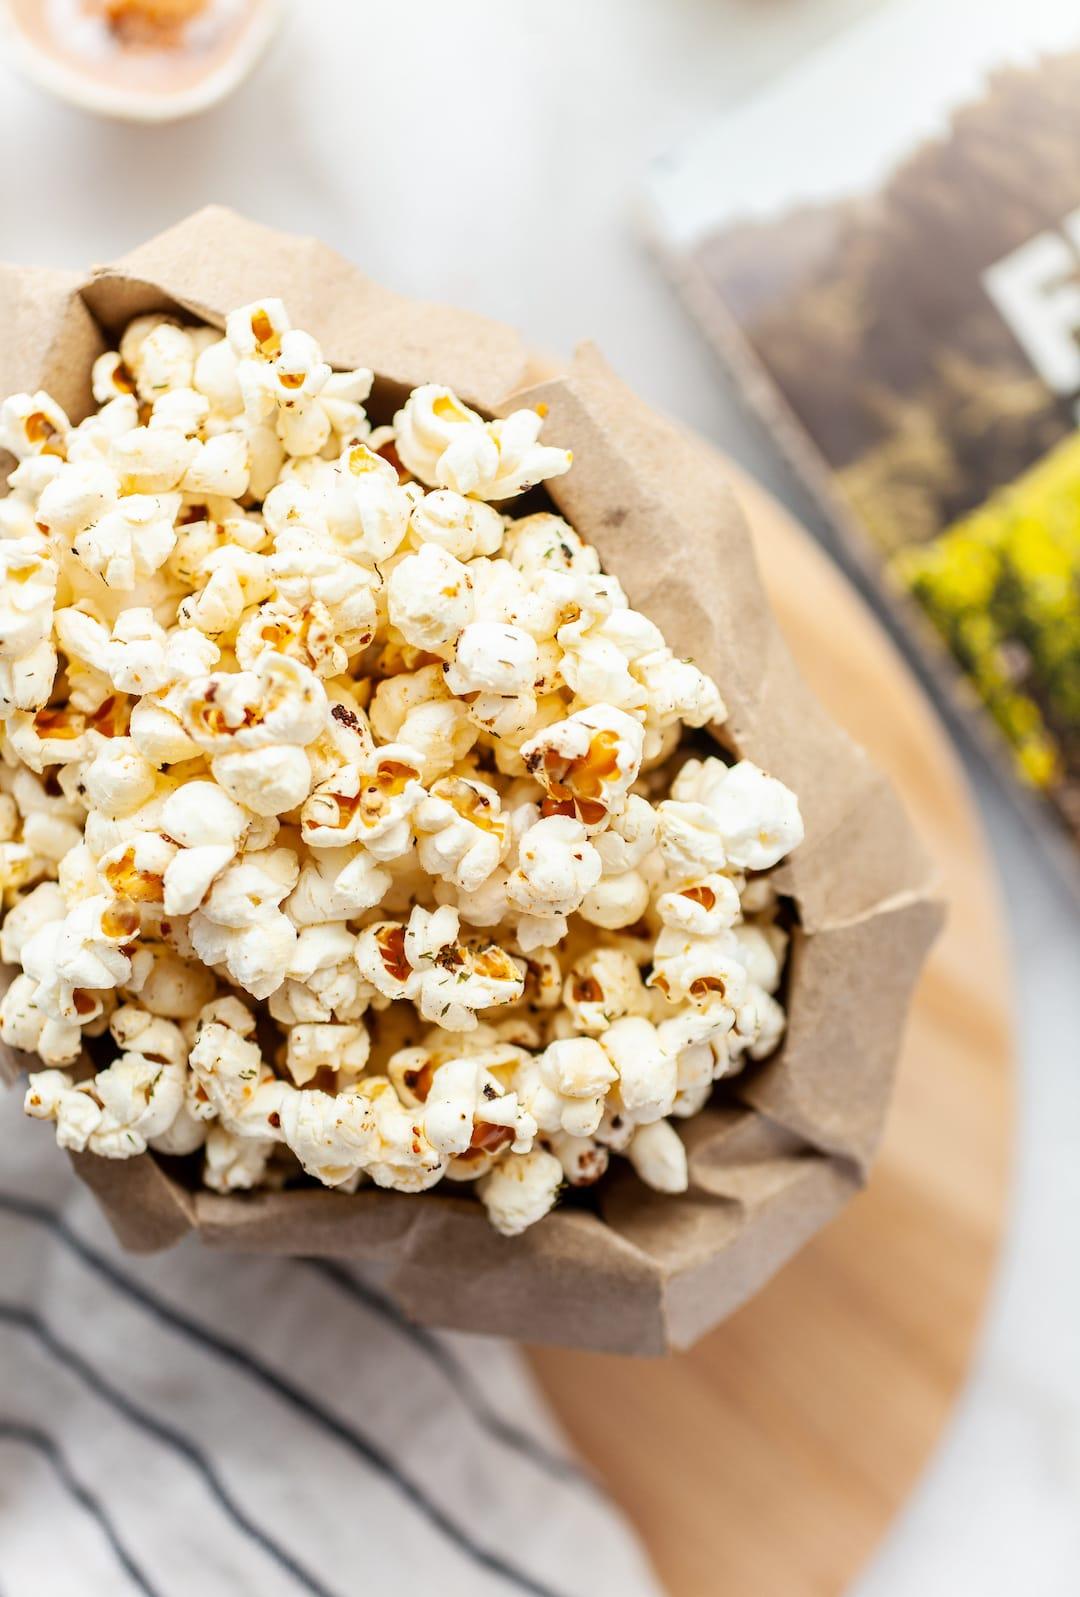 paper bag filled with instant pot popcorn